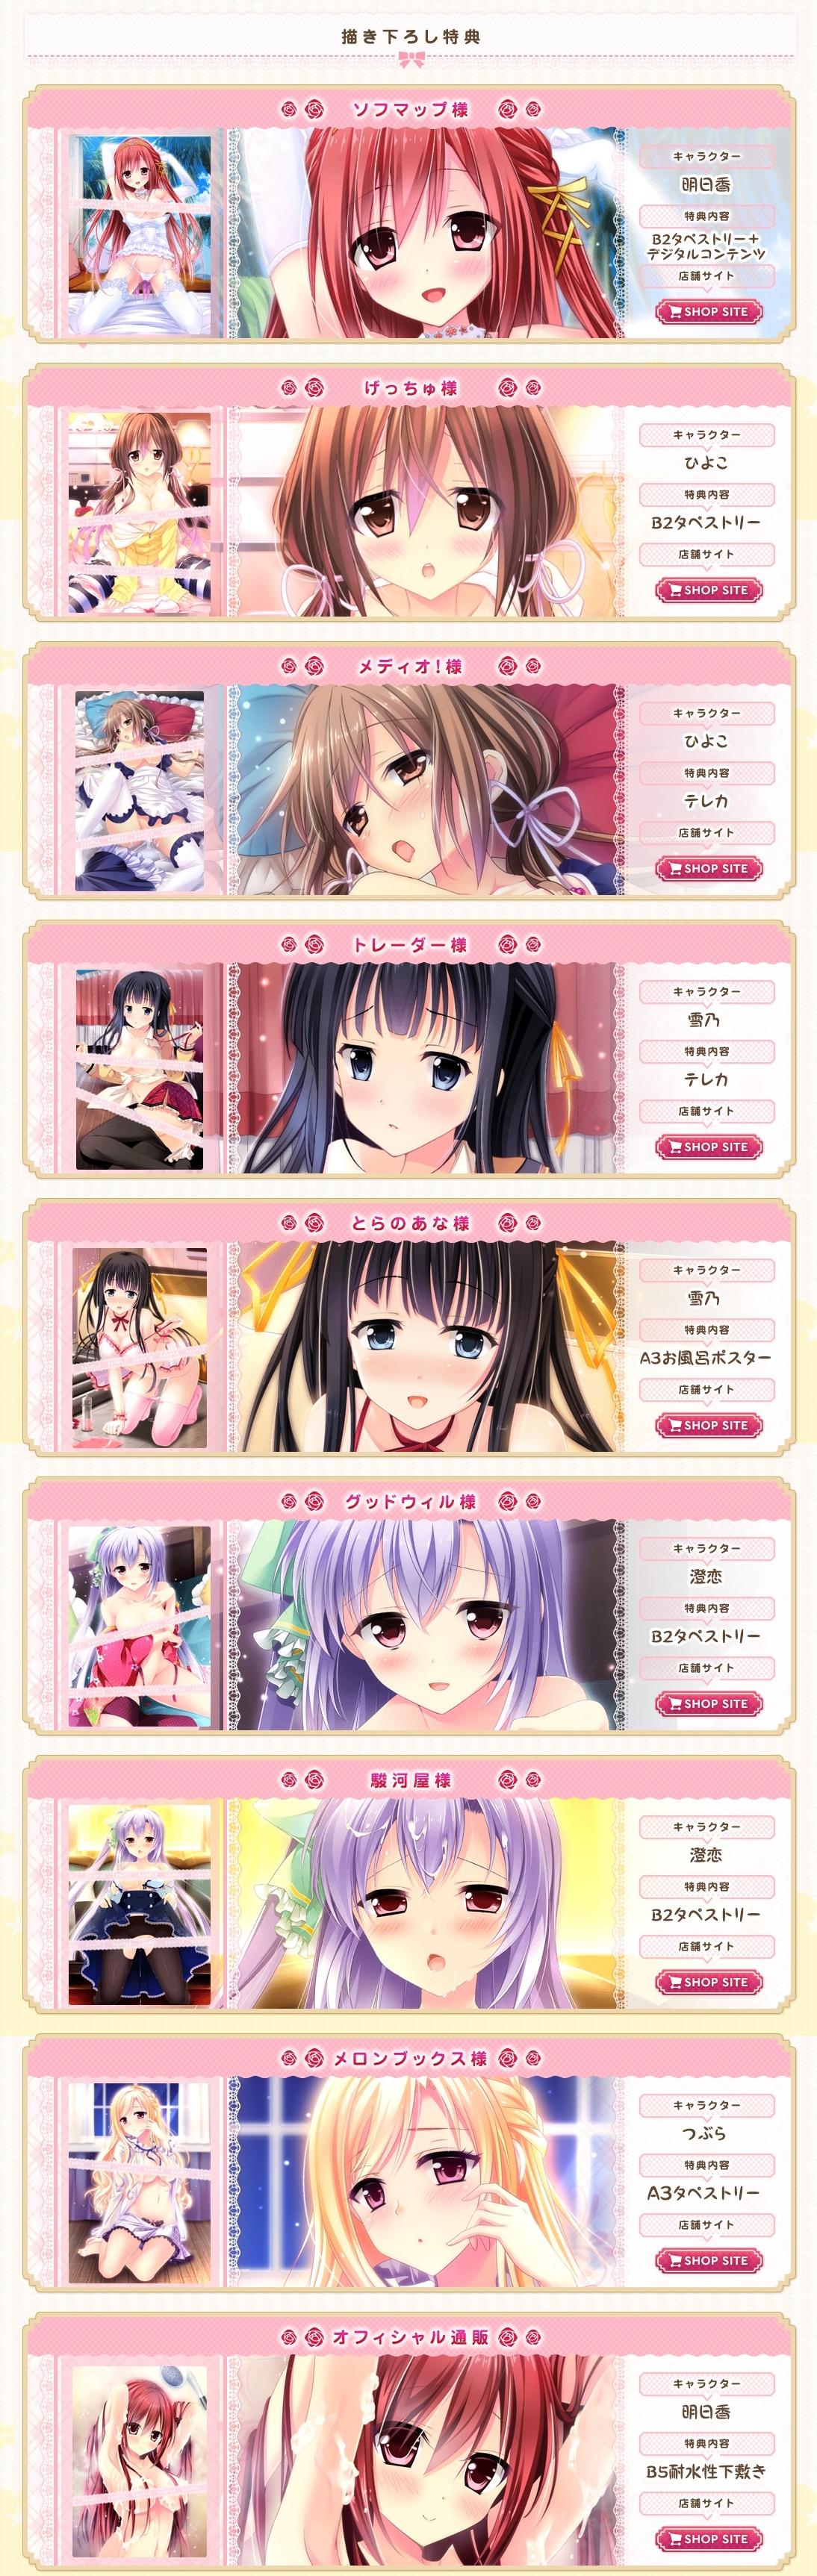 screencapture-www-ensemble-sweet-com-hanayome-shop-html-1467212056028.jpg